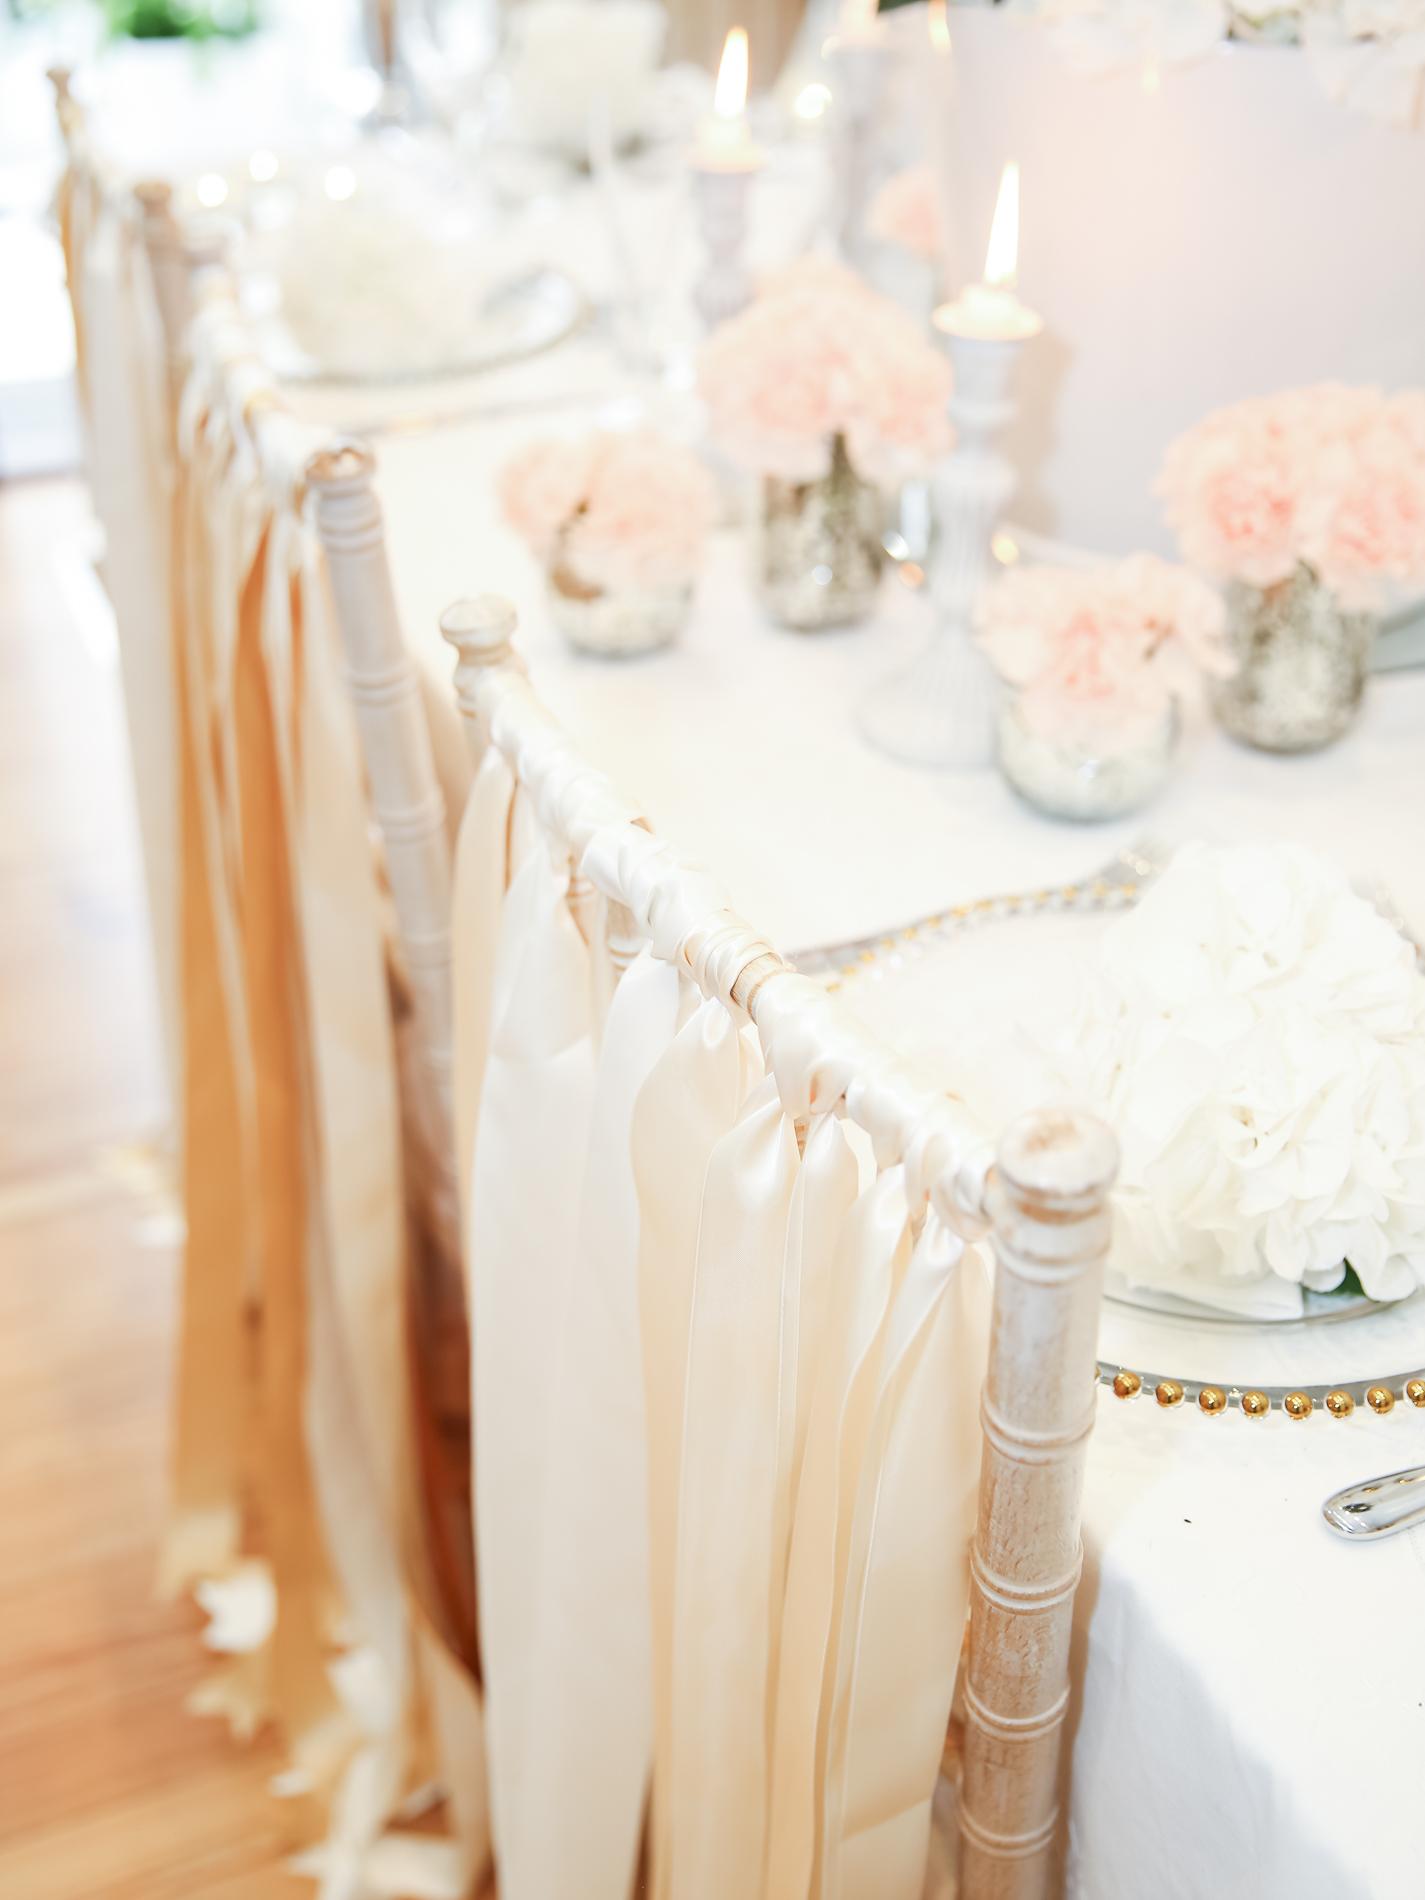 stylist, wedding stylist, chair ribbons, chair decor, wedding planner Yorkshire